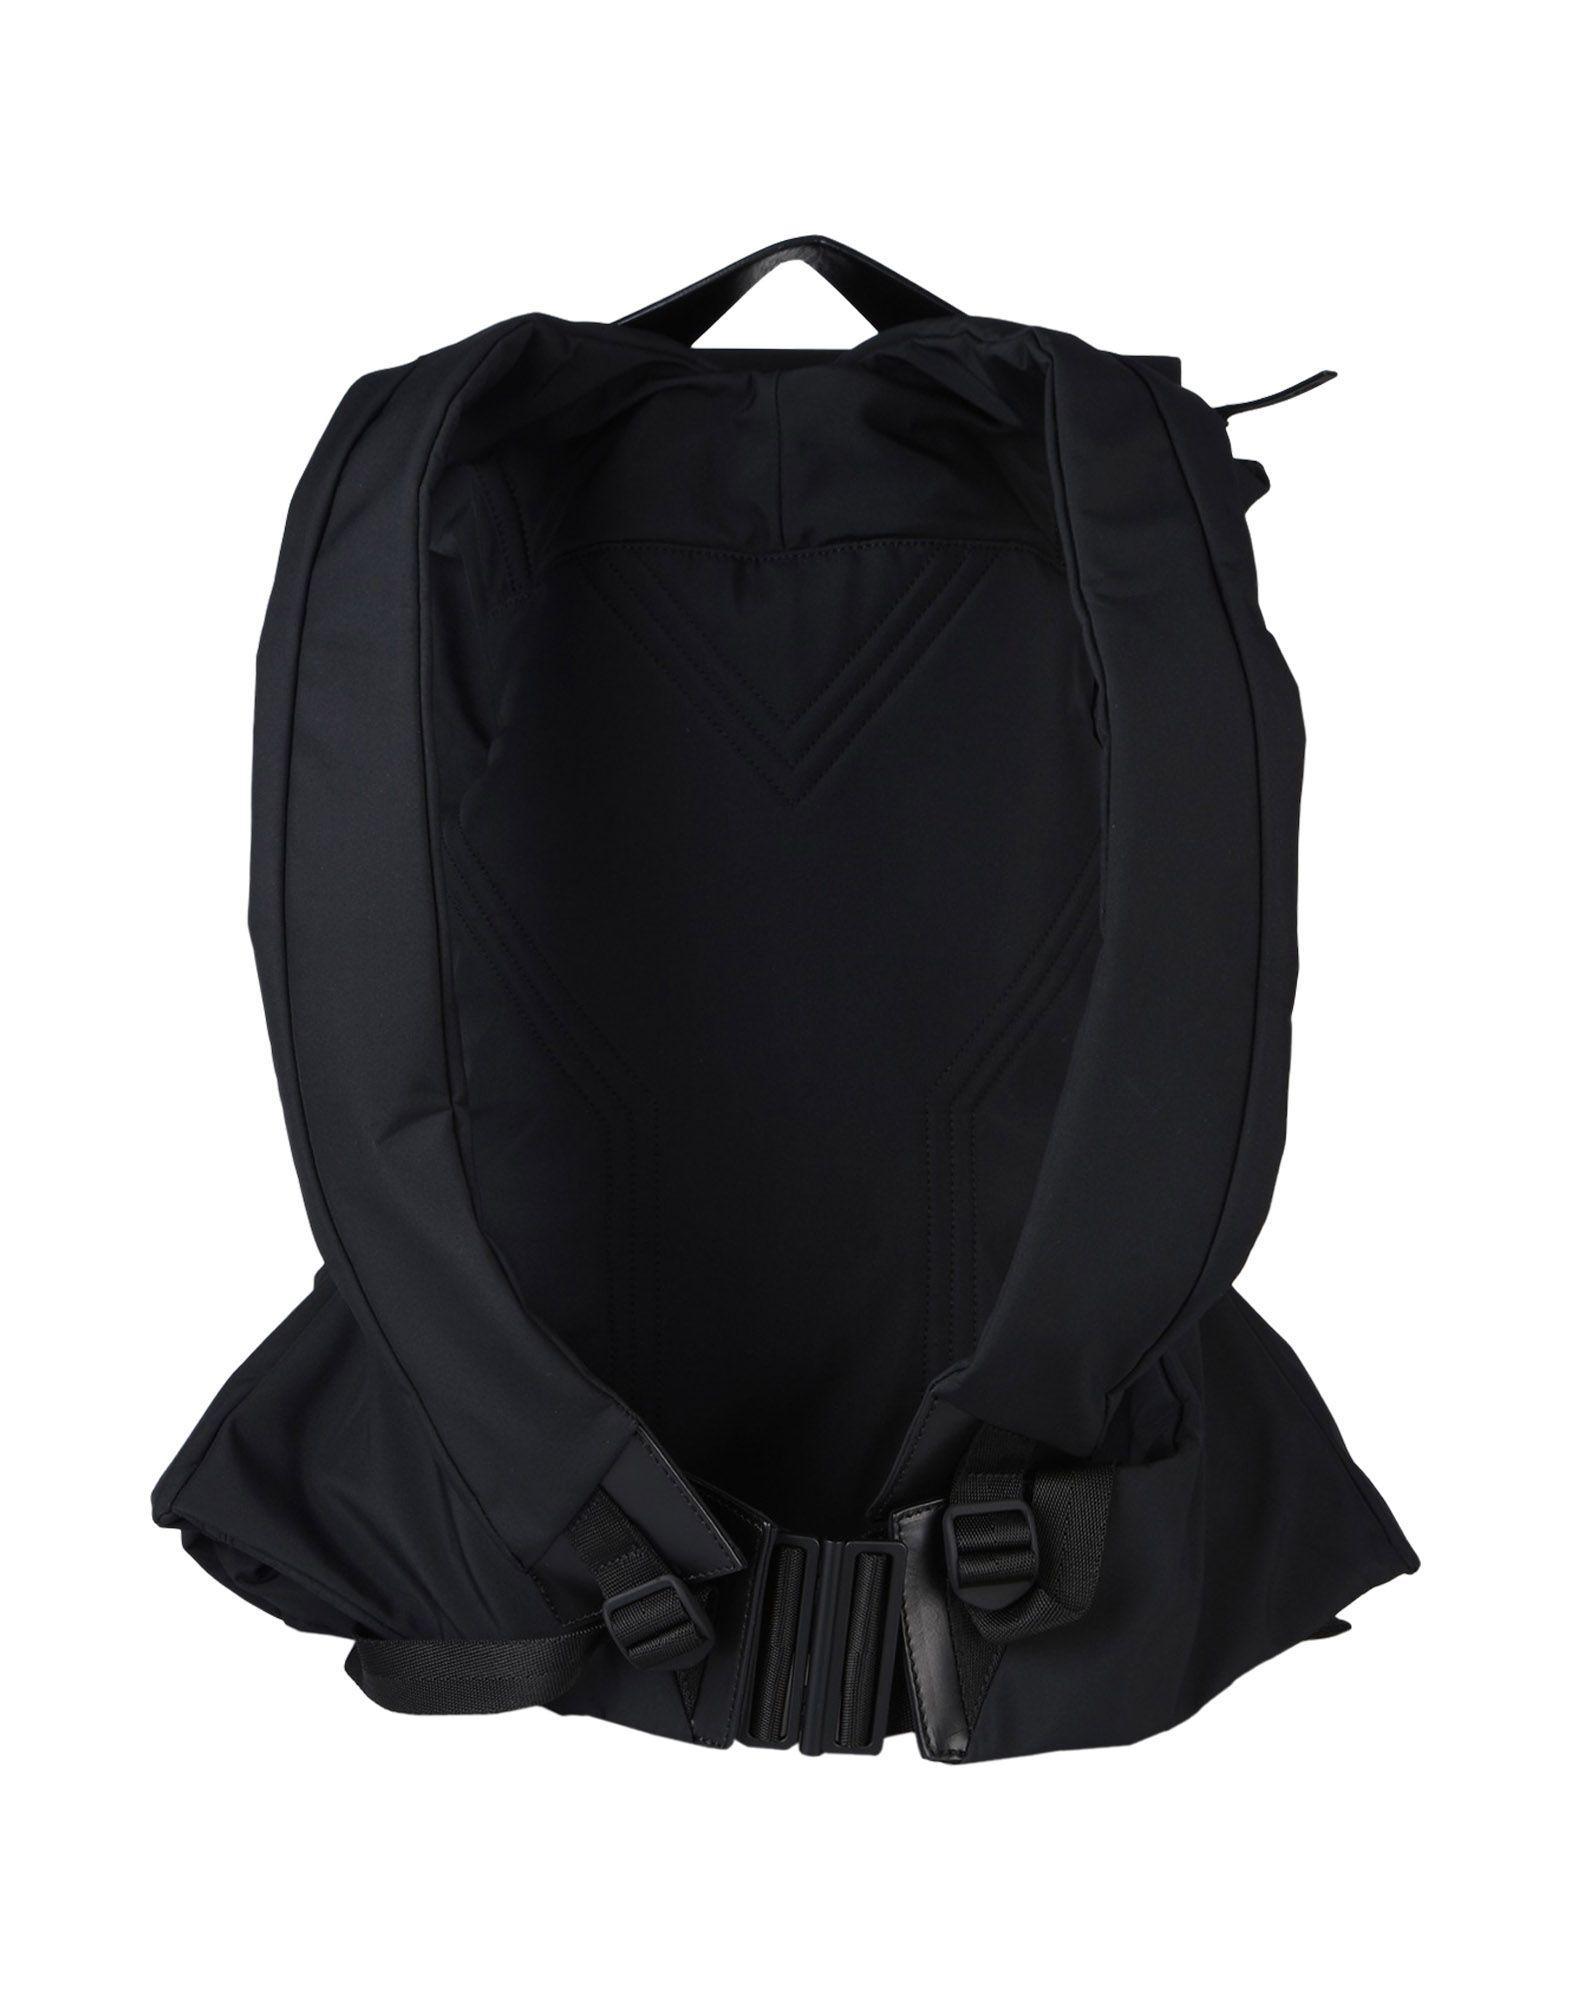 Y-3 Backpacks & Fanny Packs in Black for Men